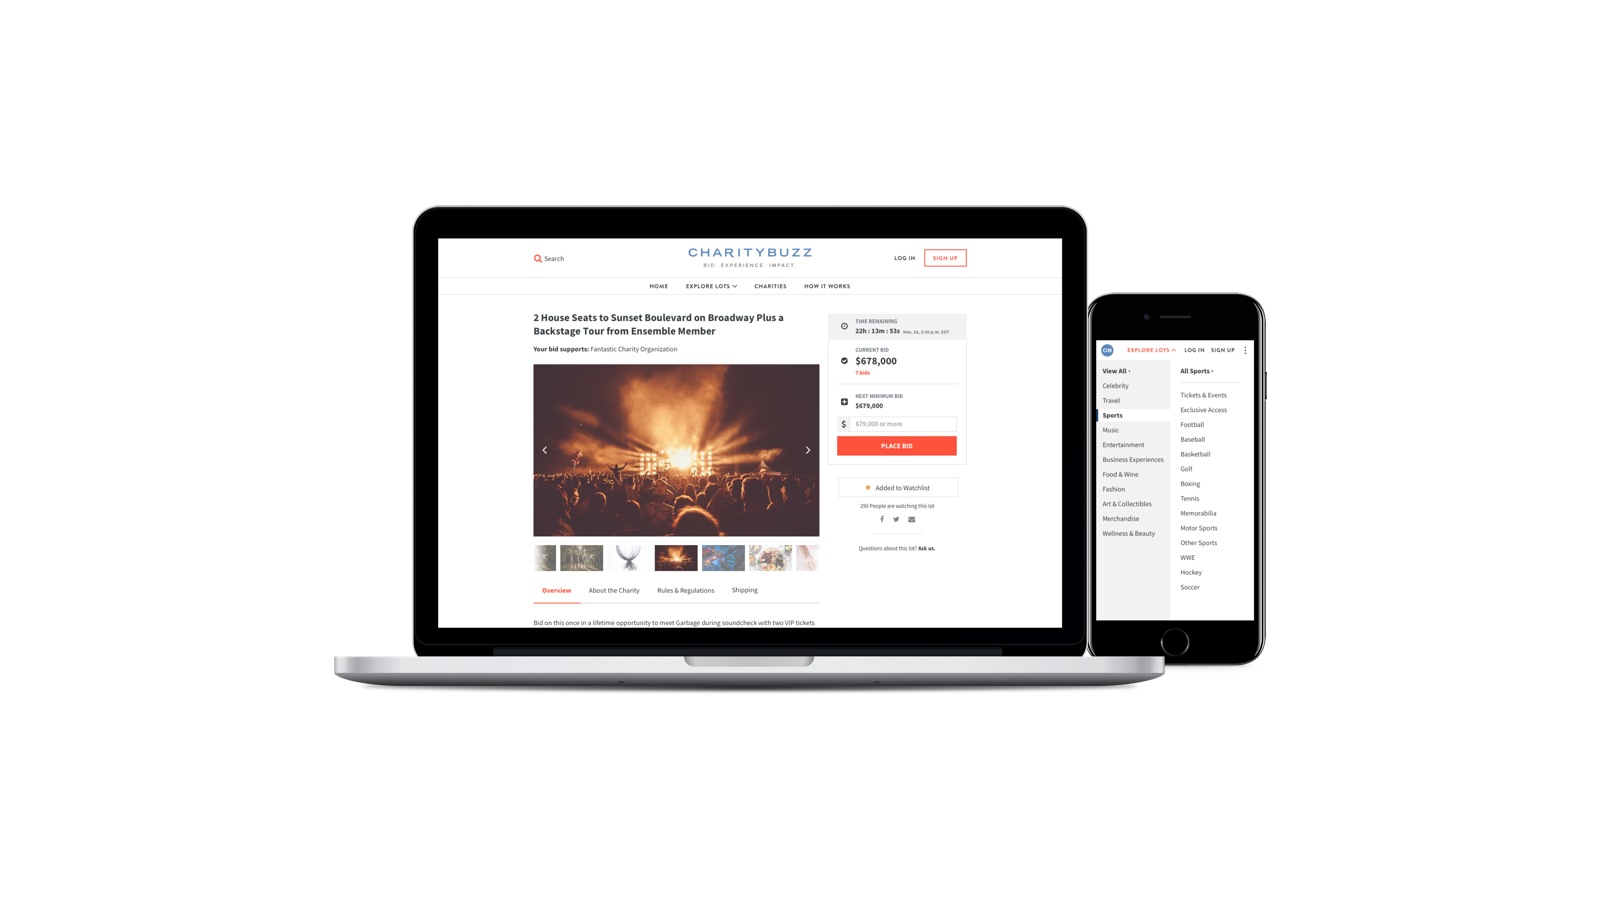 Charitybuzz website screens